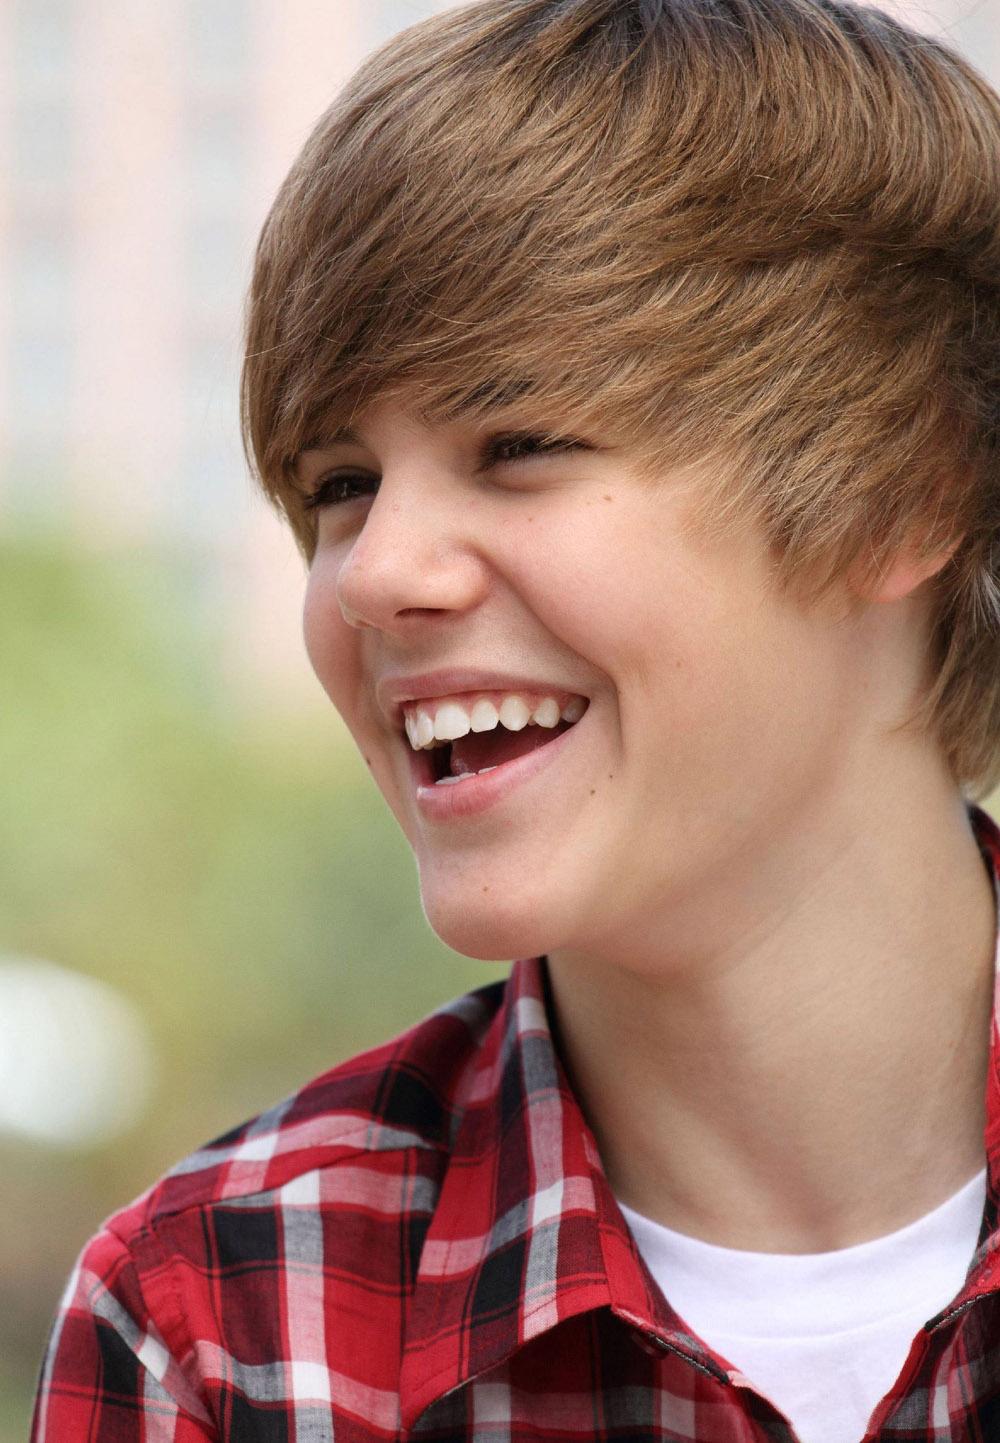 Hd wallpaper justin bieber - Number 1 Bieliebers X Images Justin Bieber Hd Wallpaper And Background Photos